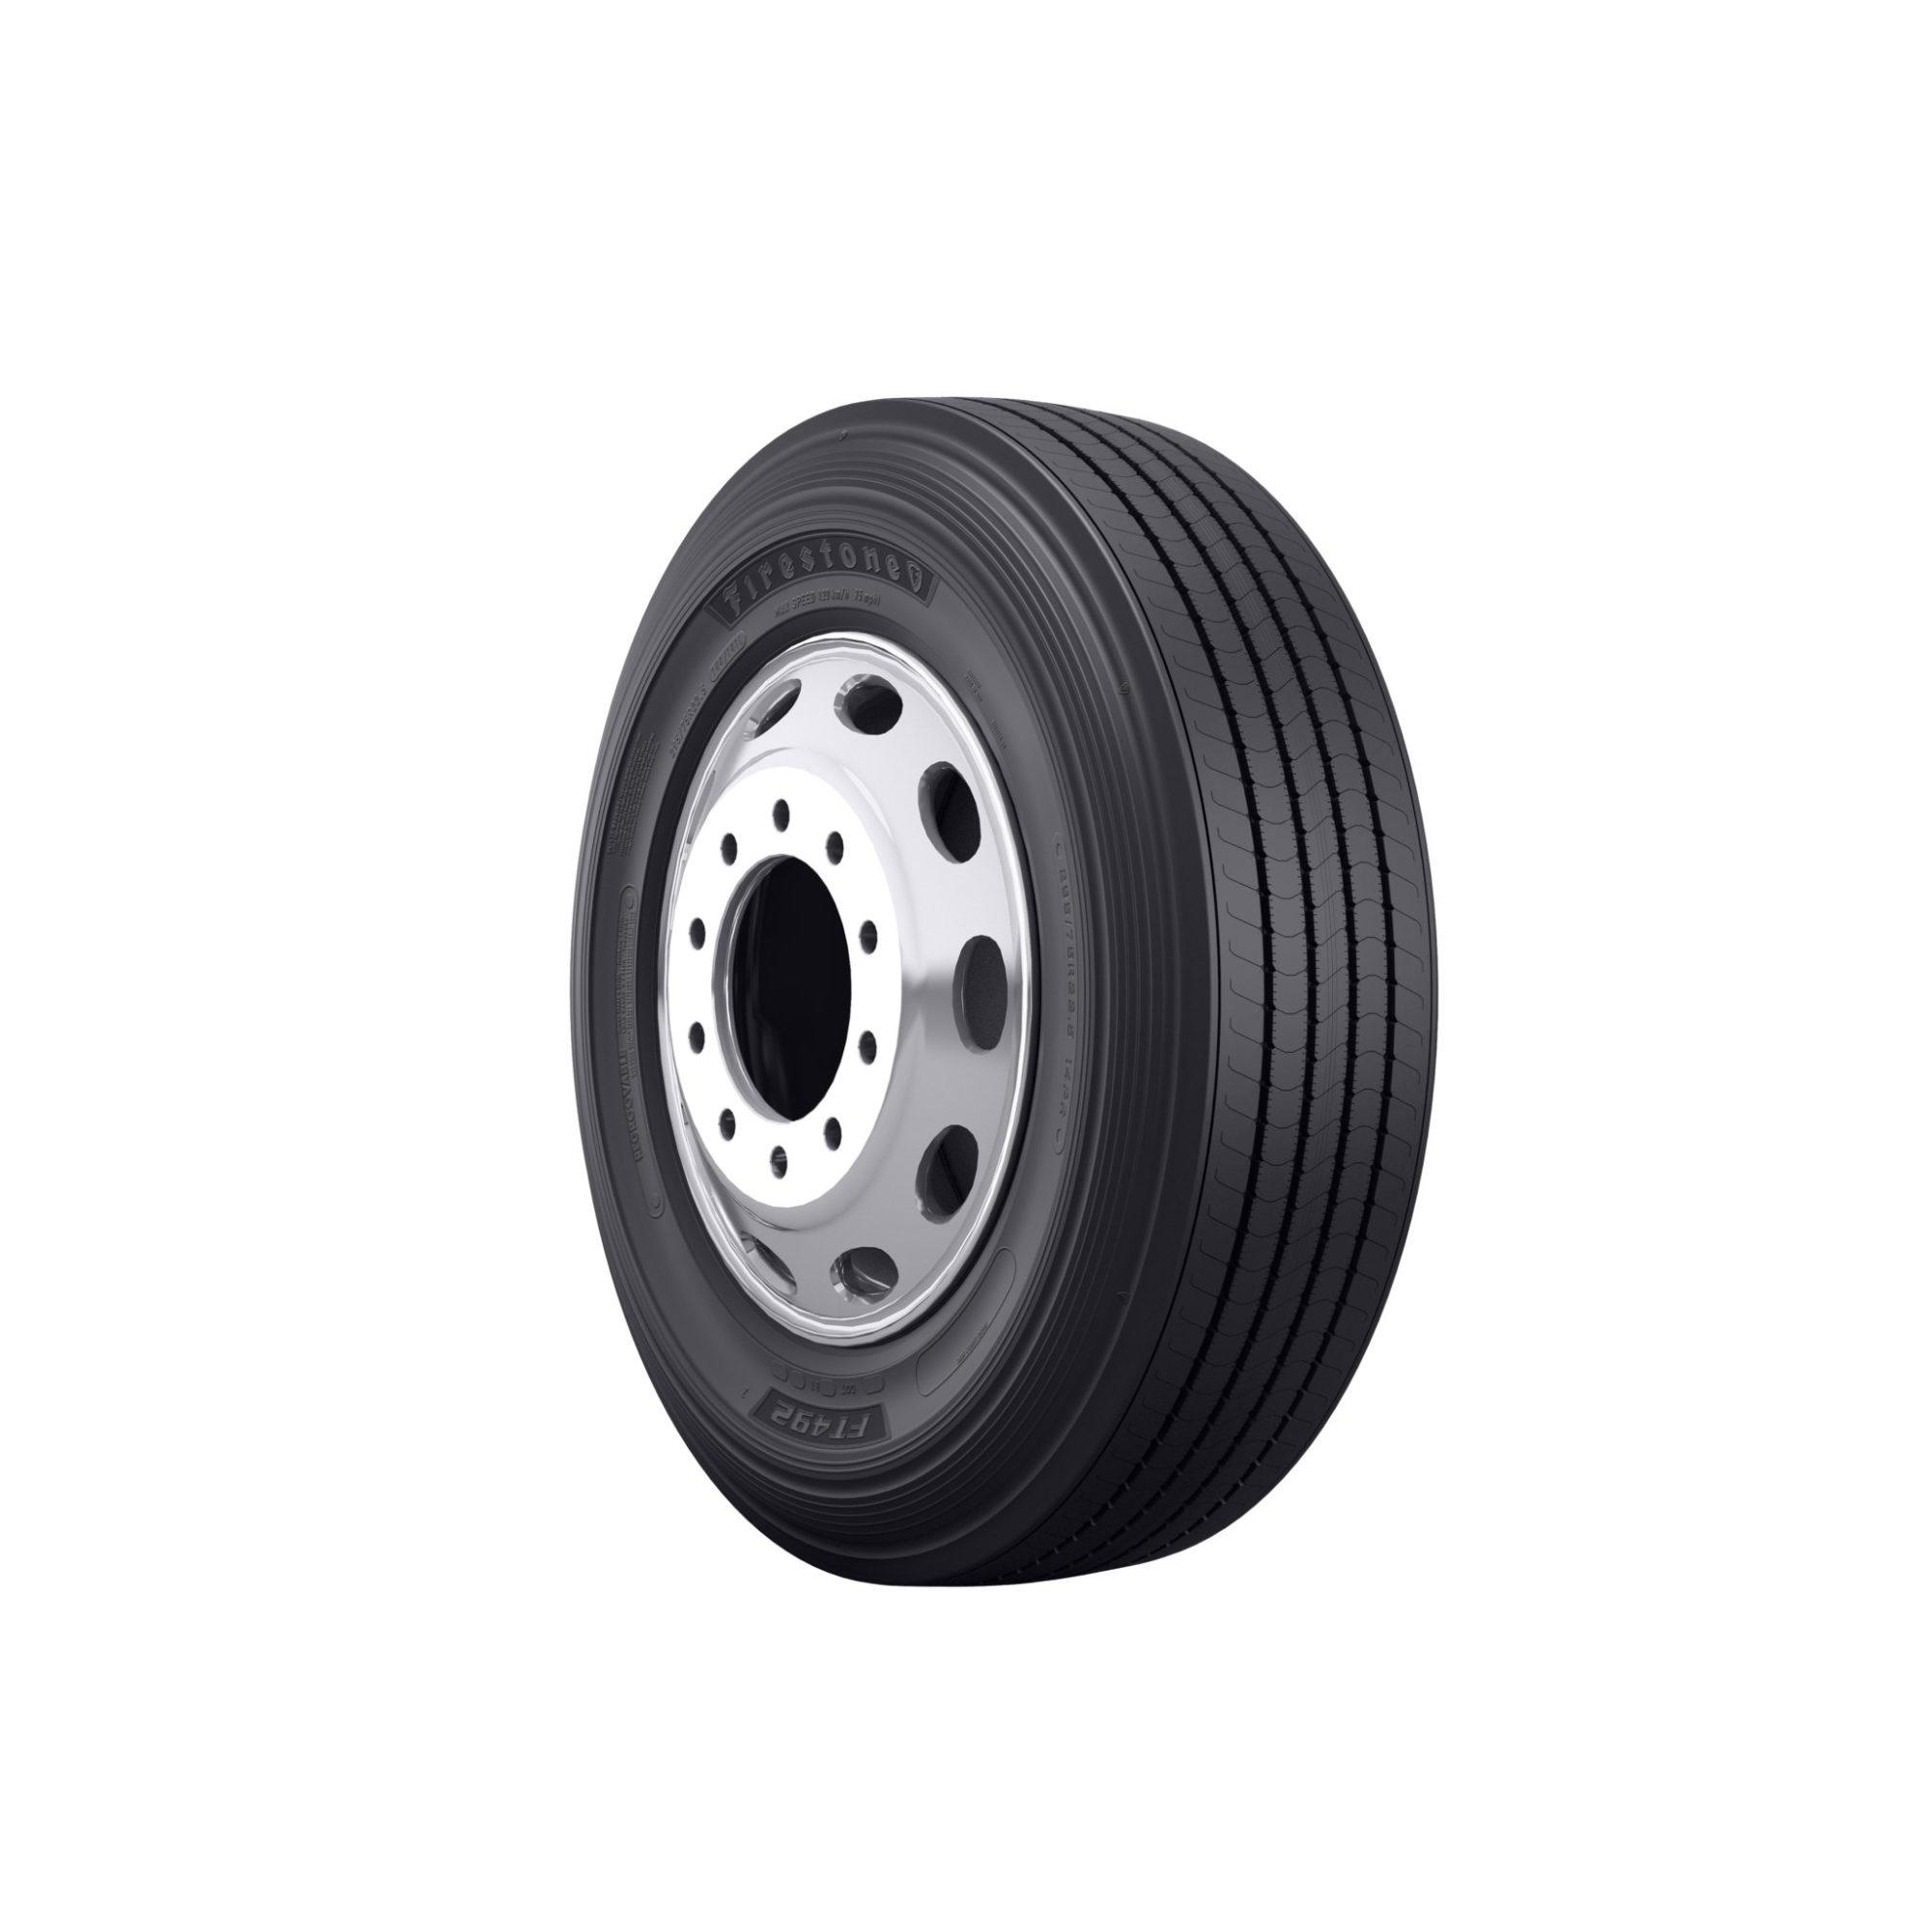 Bridgestone FT492 tire